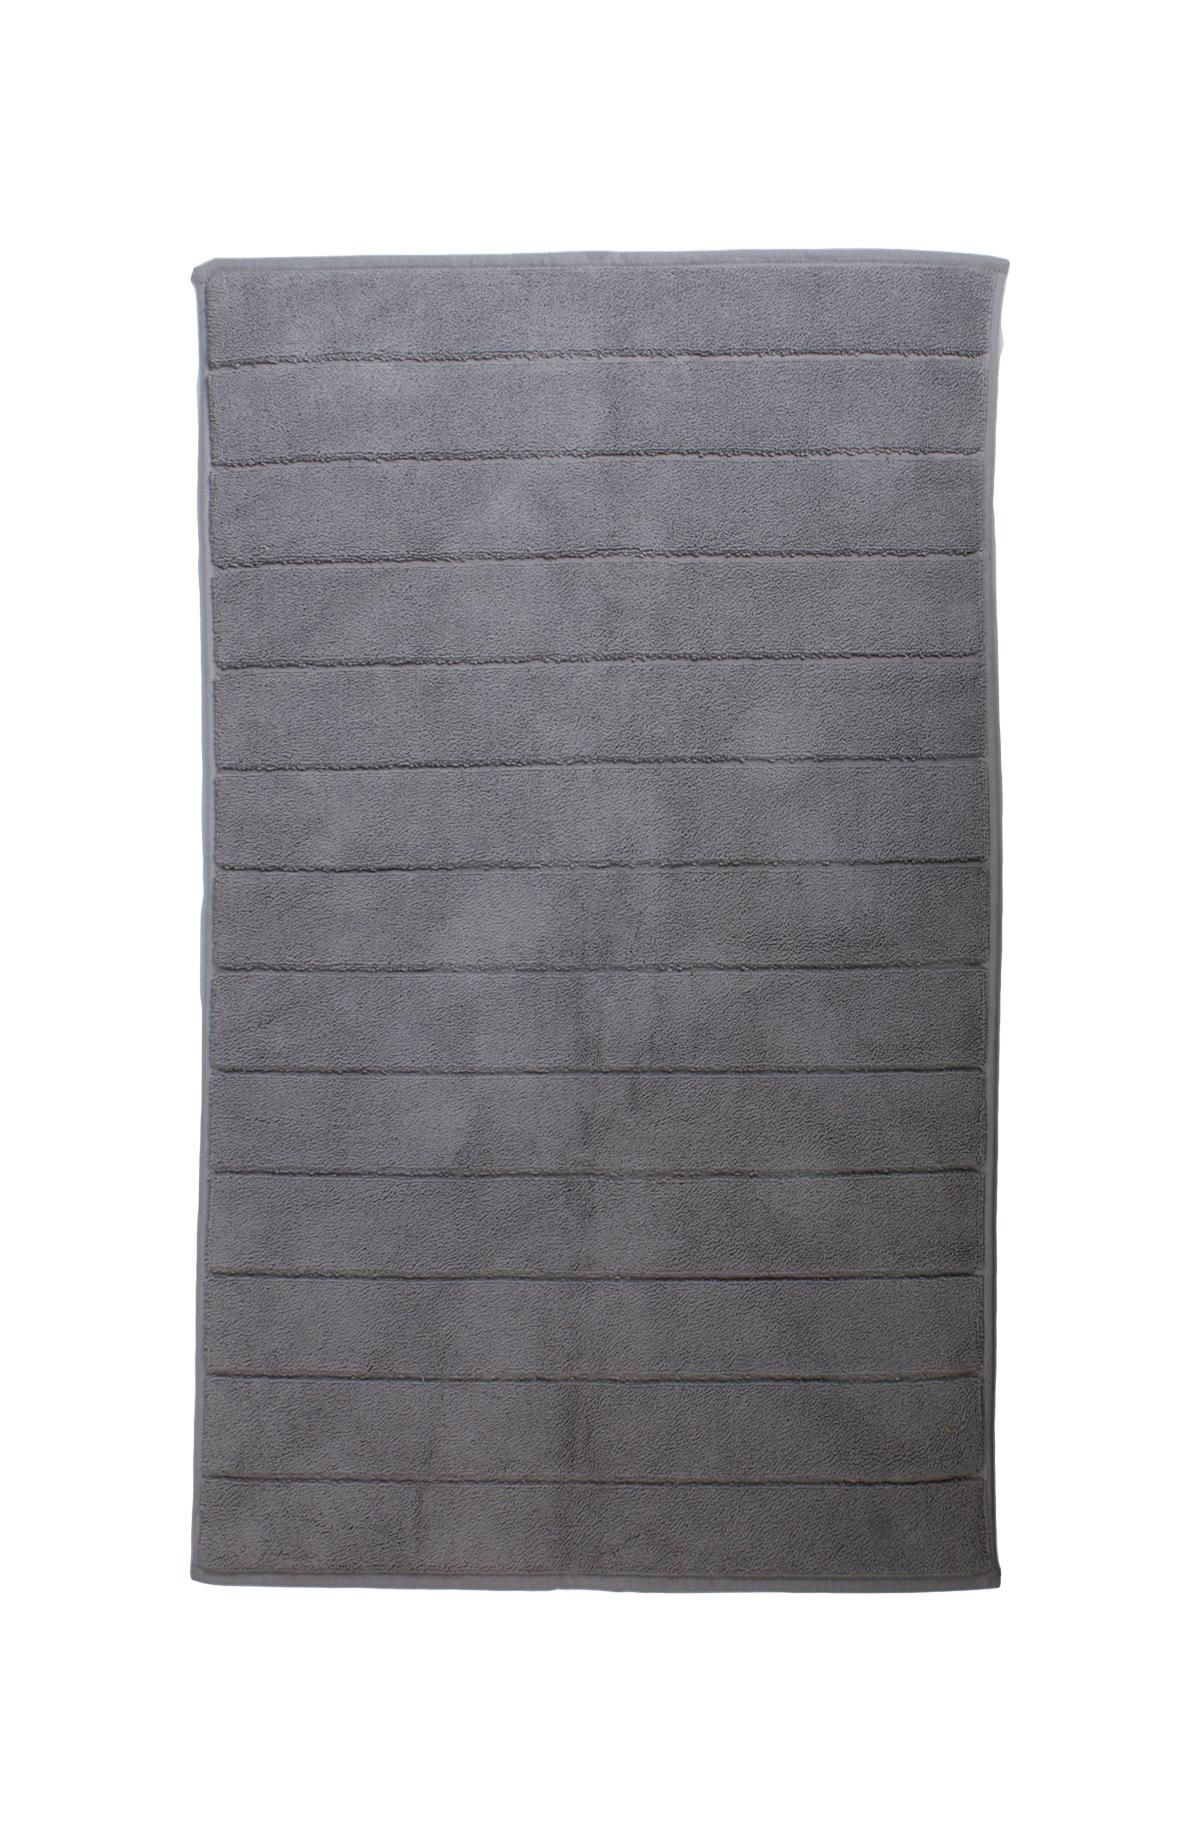 deyongs terry bath mat jarrold norwich. Black Bedroom Furniture Sets. Home Design Ideas